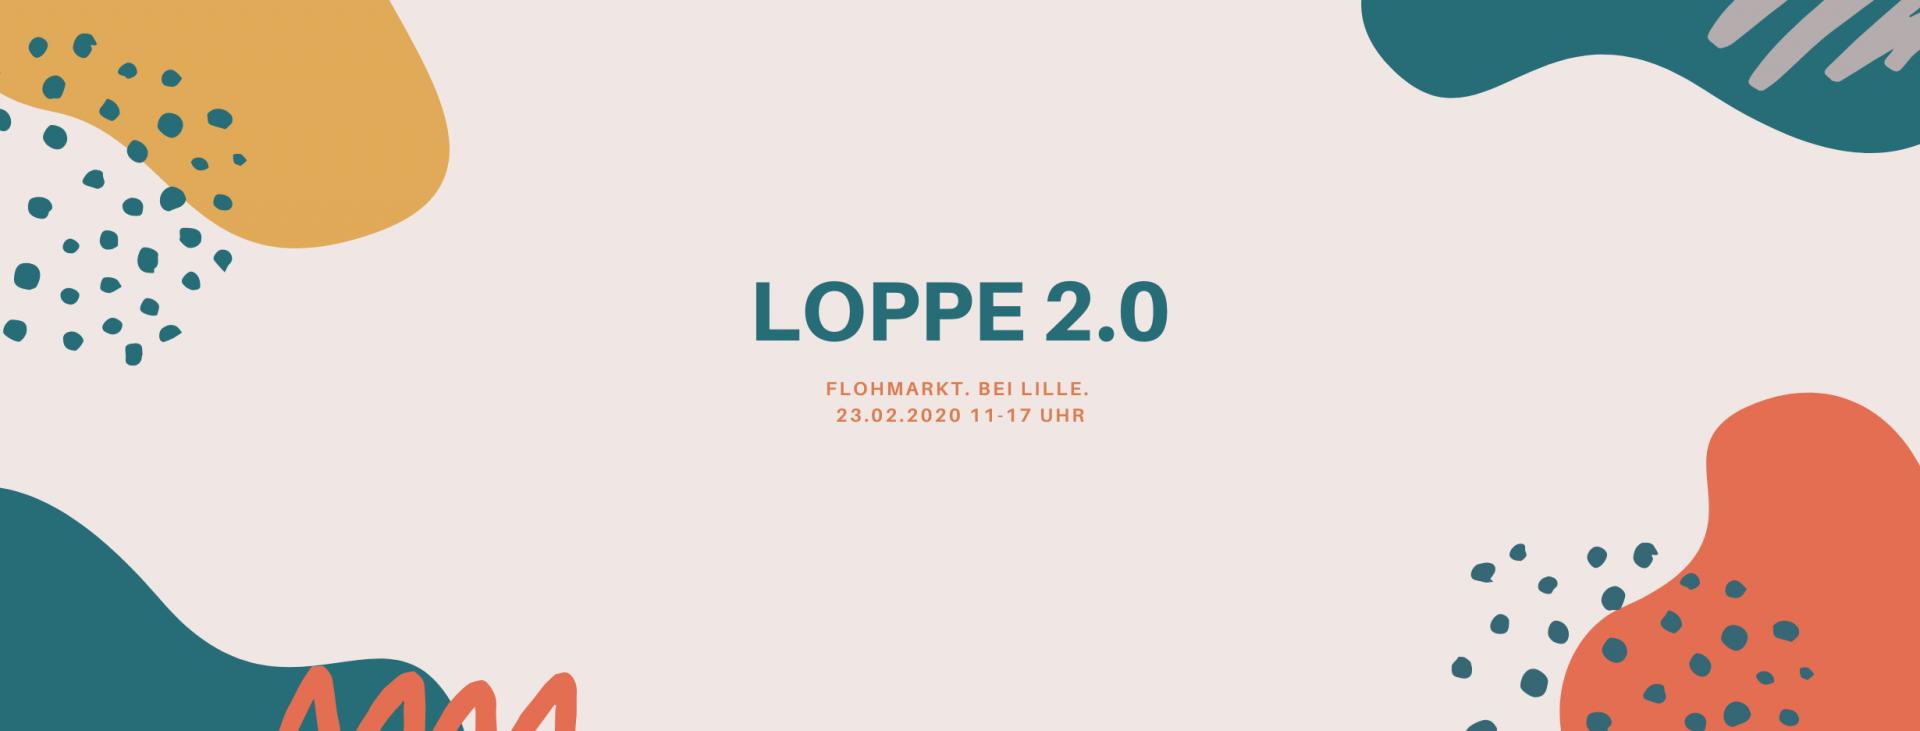 Loppe